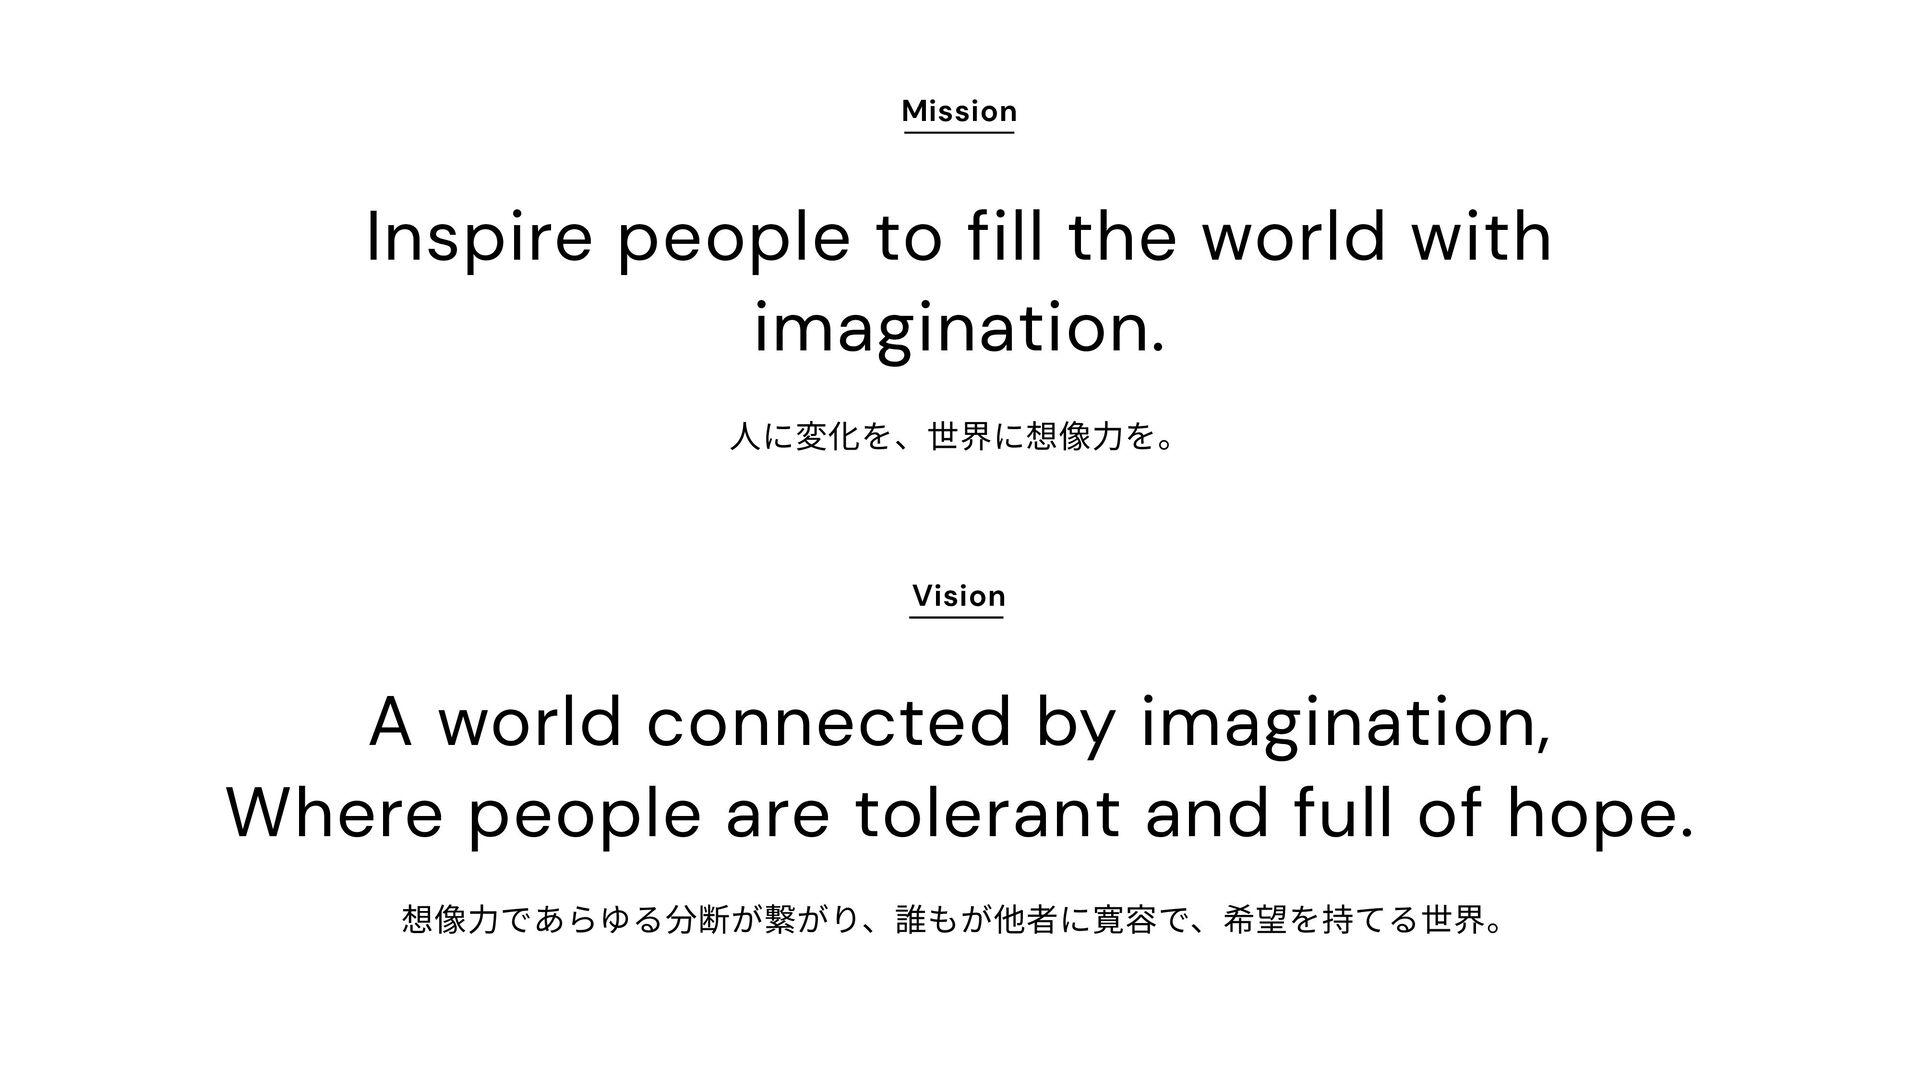 Mission, Vision, Value | 010 اۀ͕ۀΛ௨ͯ͠ϛογϣϯΛ͠...